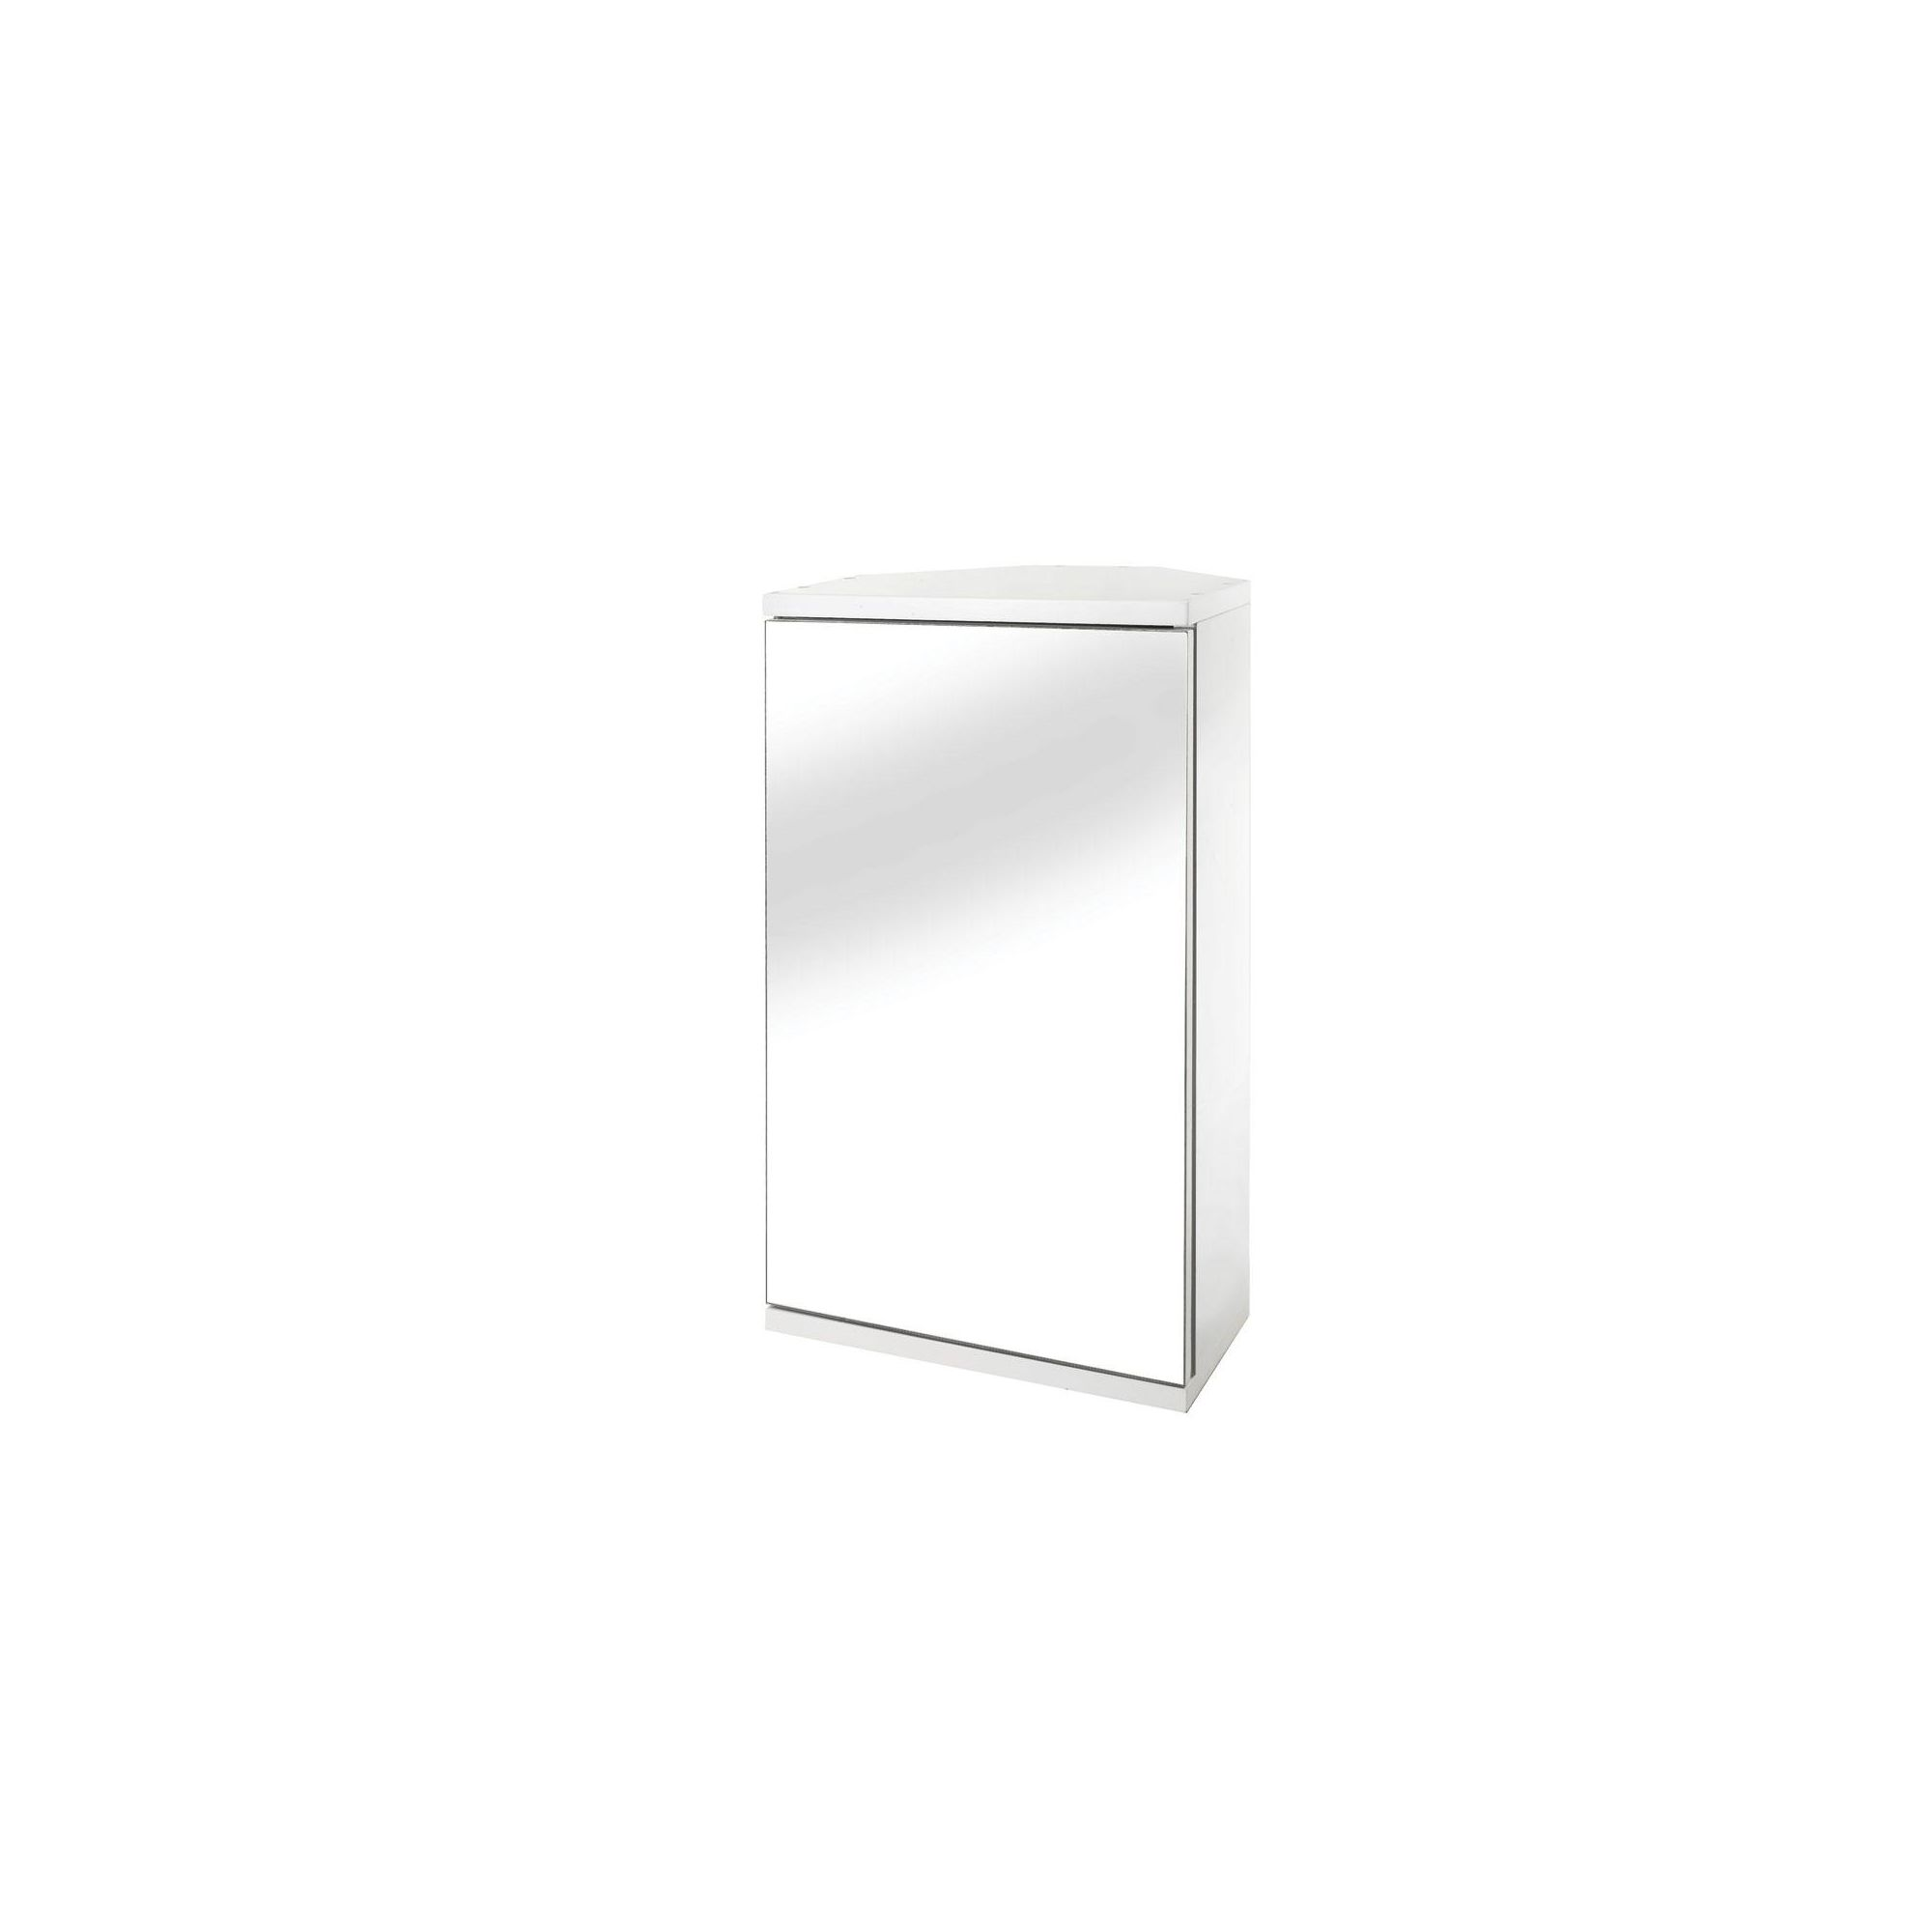 Croydex Simplicity Self-Assembly 1 Door Bathroom Corner Cabinet